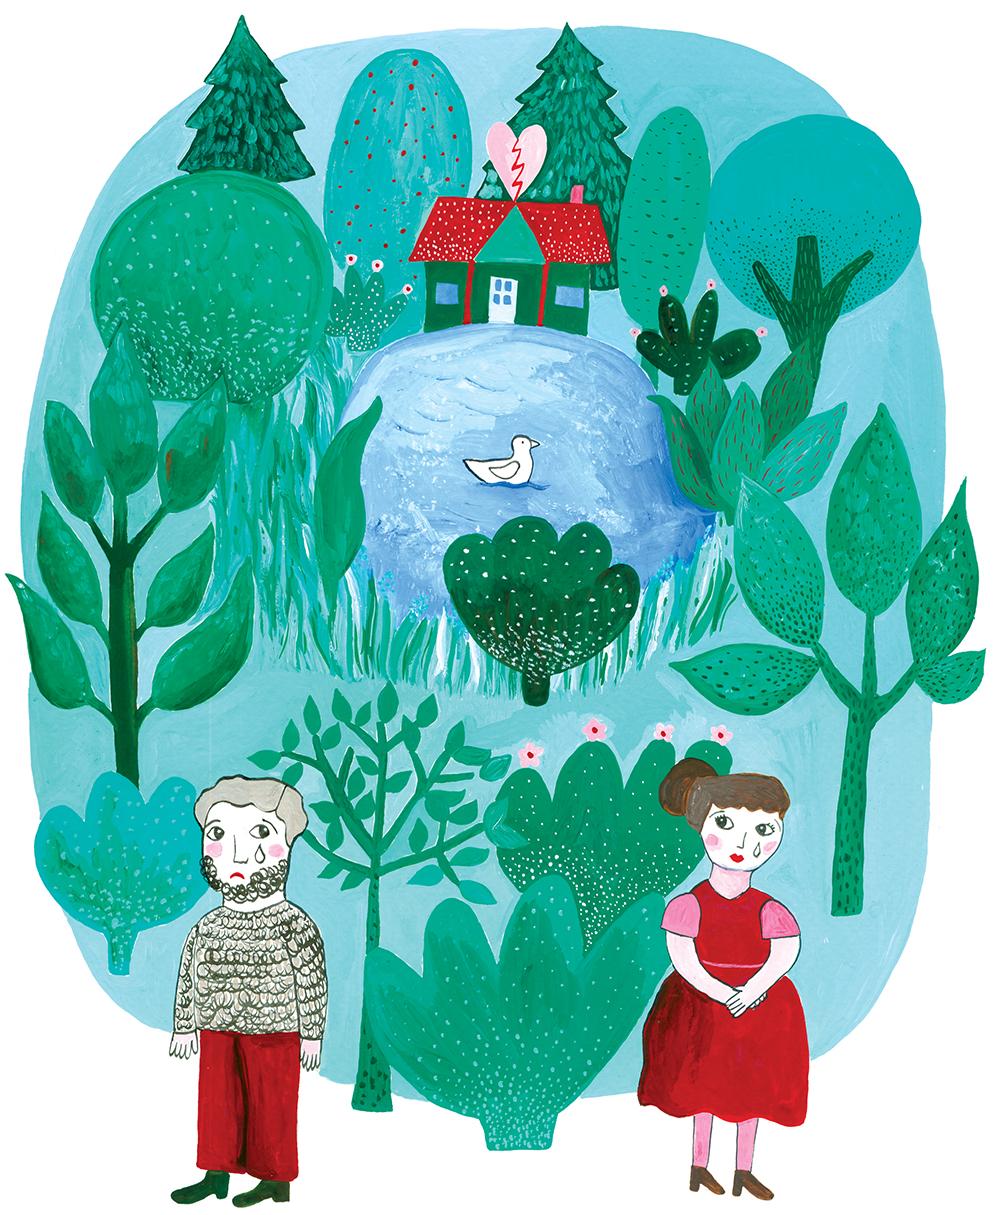 Lotje & Co illustration by Marenthe.jpg